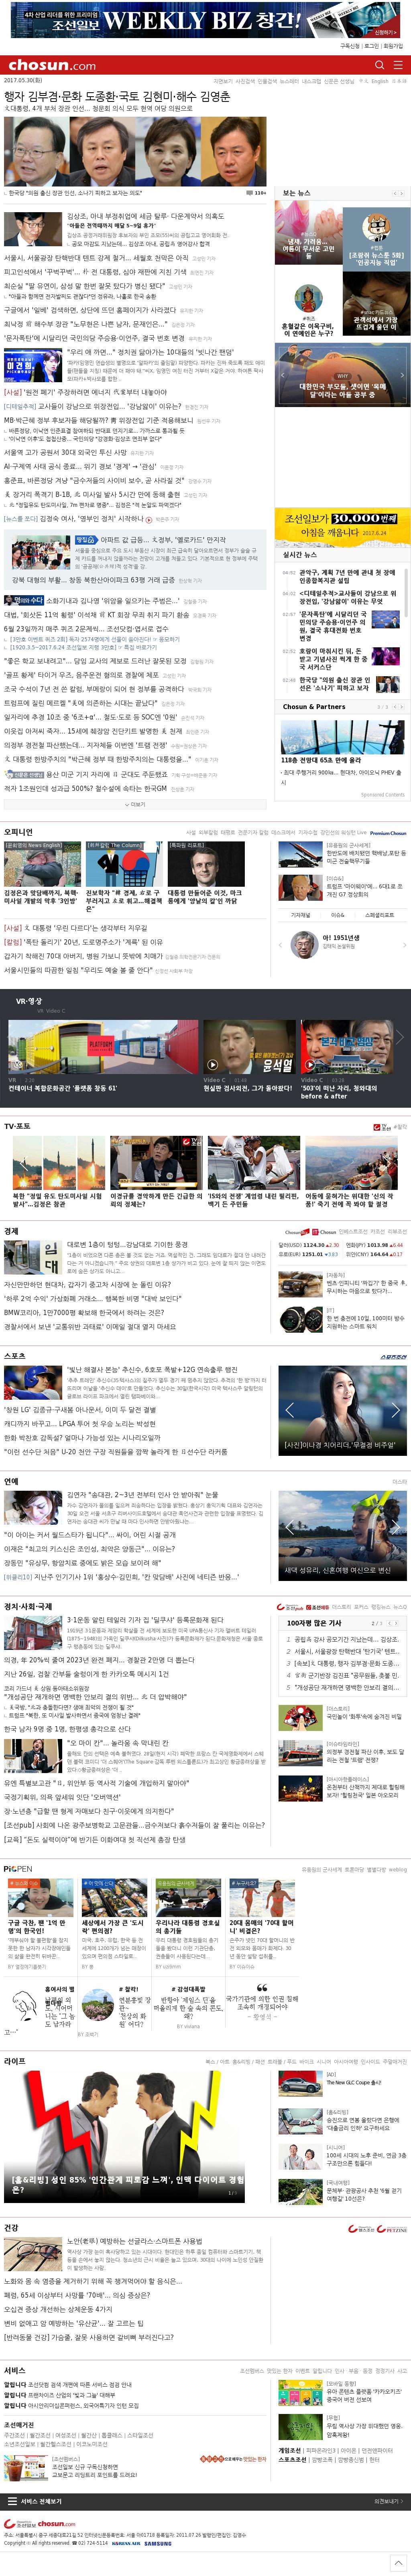 chosun.com at Tuesday May 30, 2017, 5:04 a.m. UTC